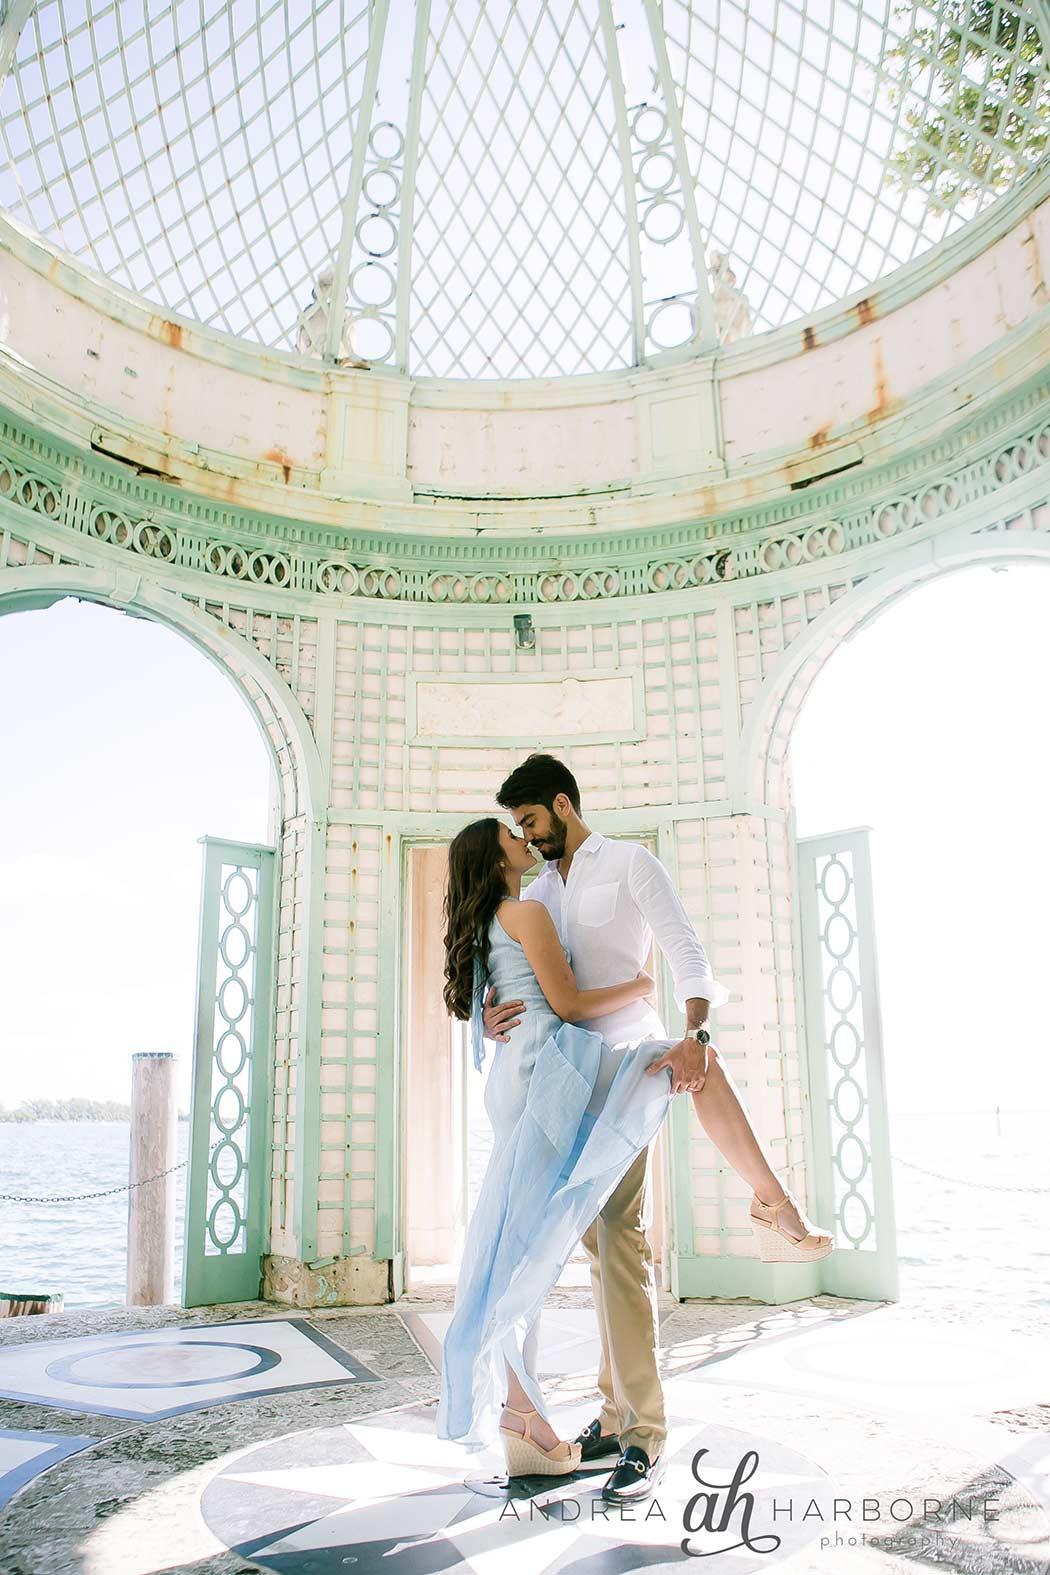 Romantic Couples Photoshoot Vizcaya Miami Andrea